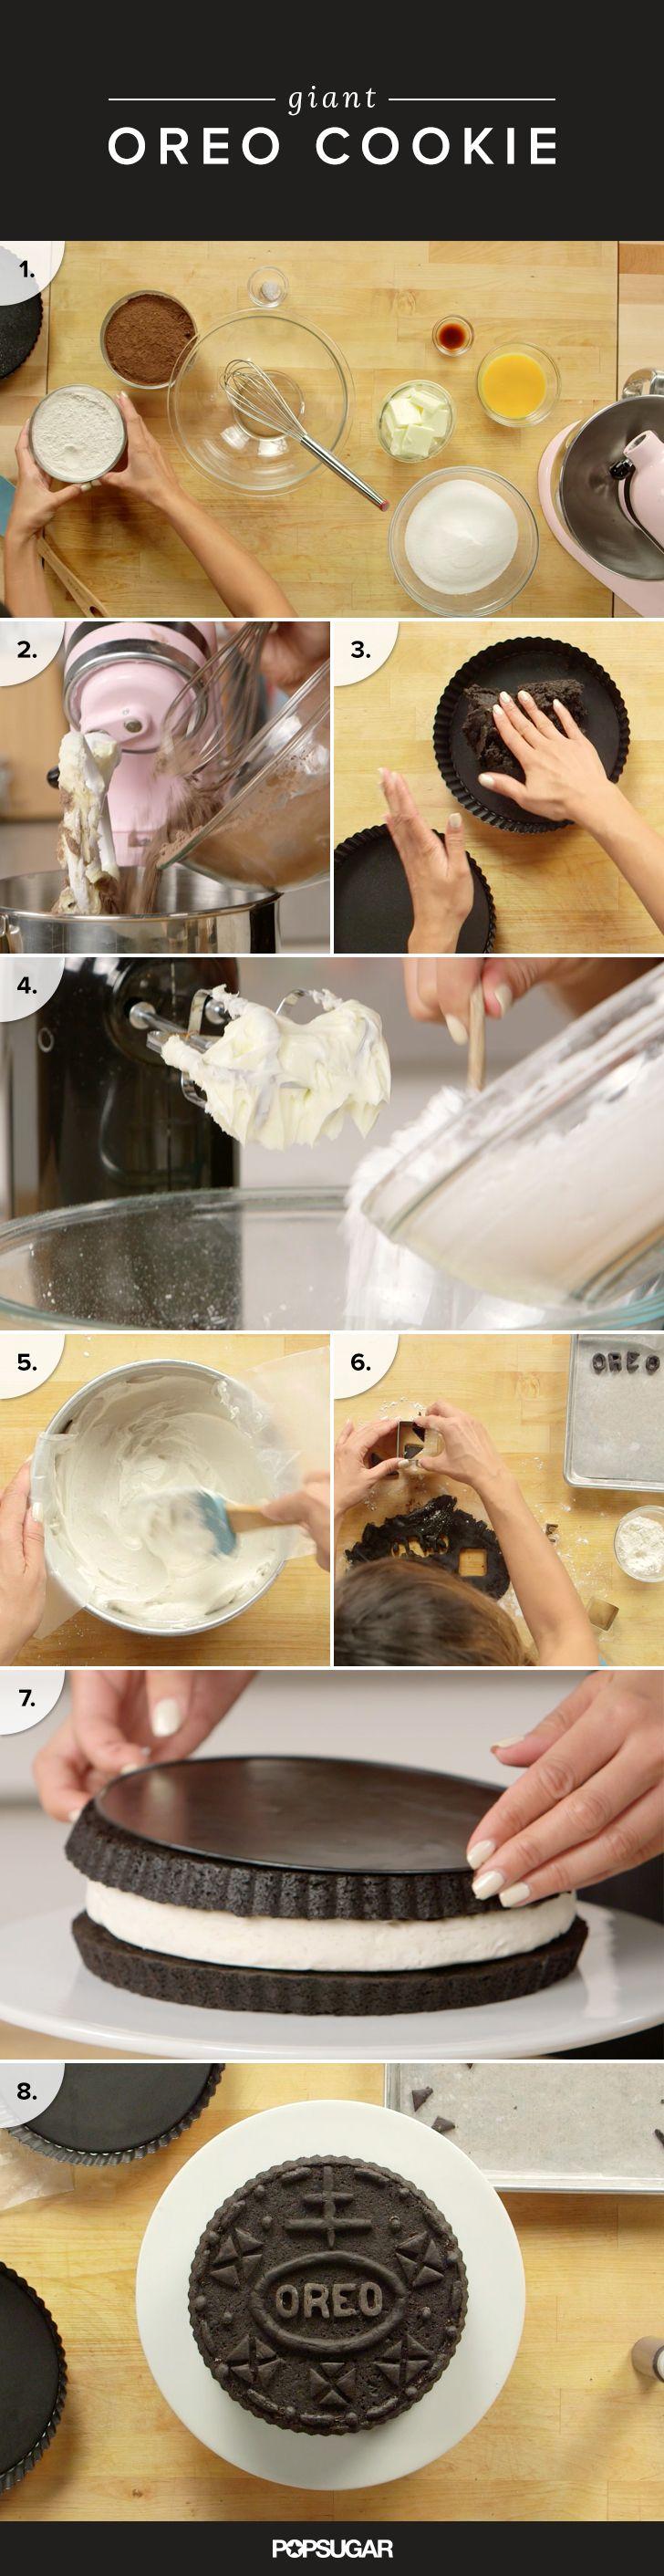 oreo churros how to cook